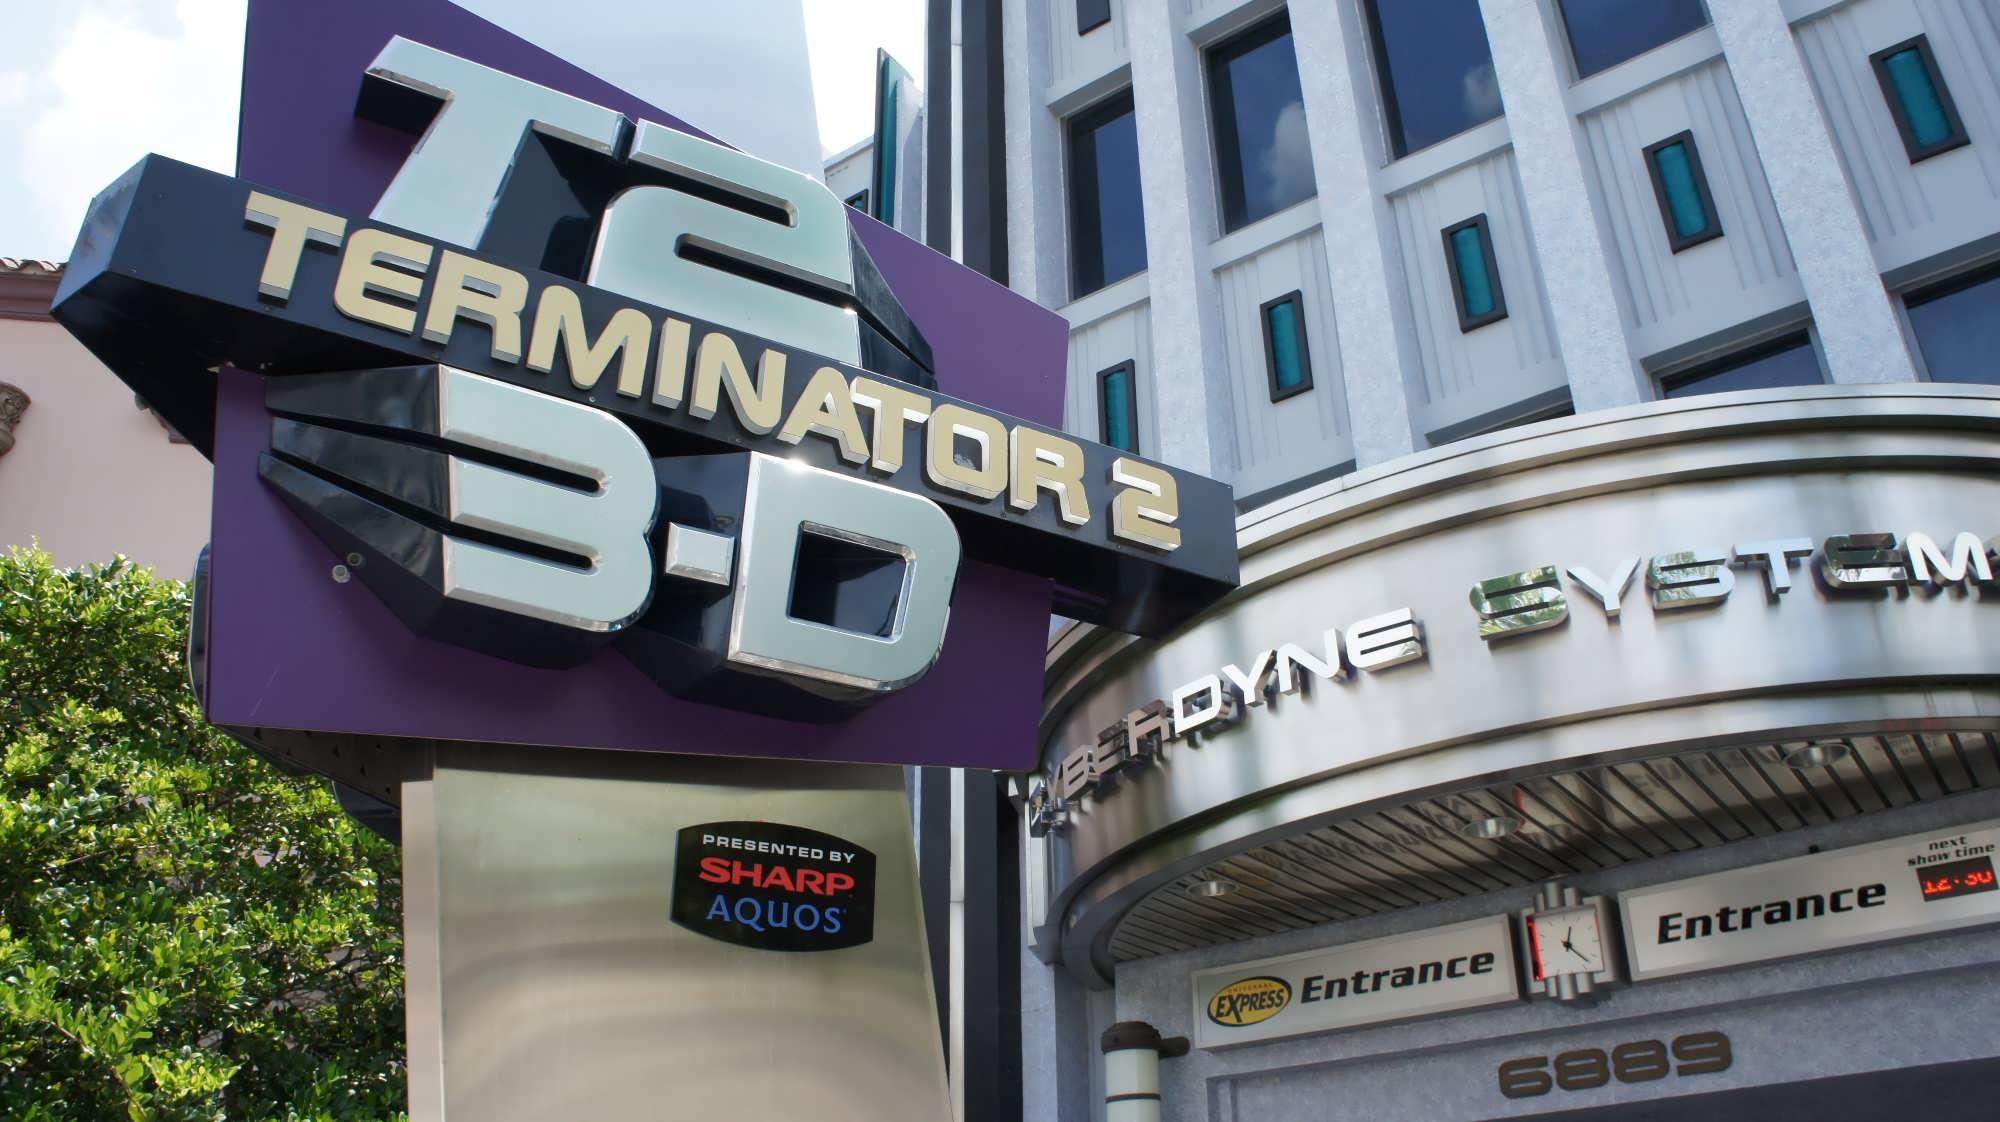 Terminator 2:3D's Final Performance - Universal Studios ...